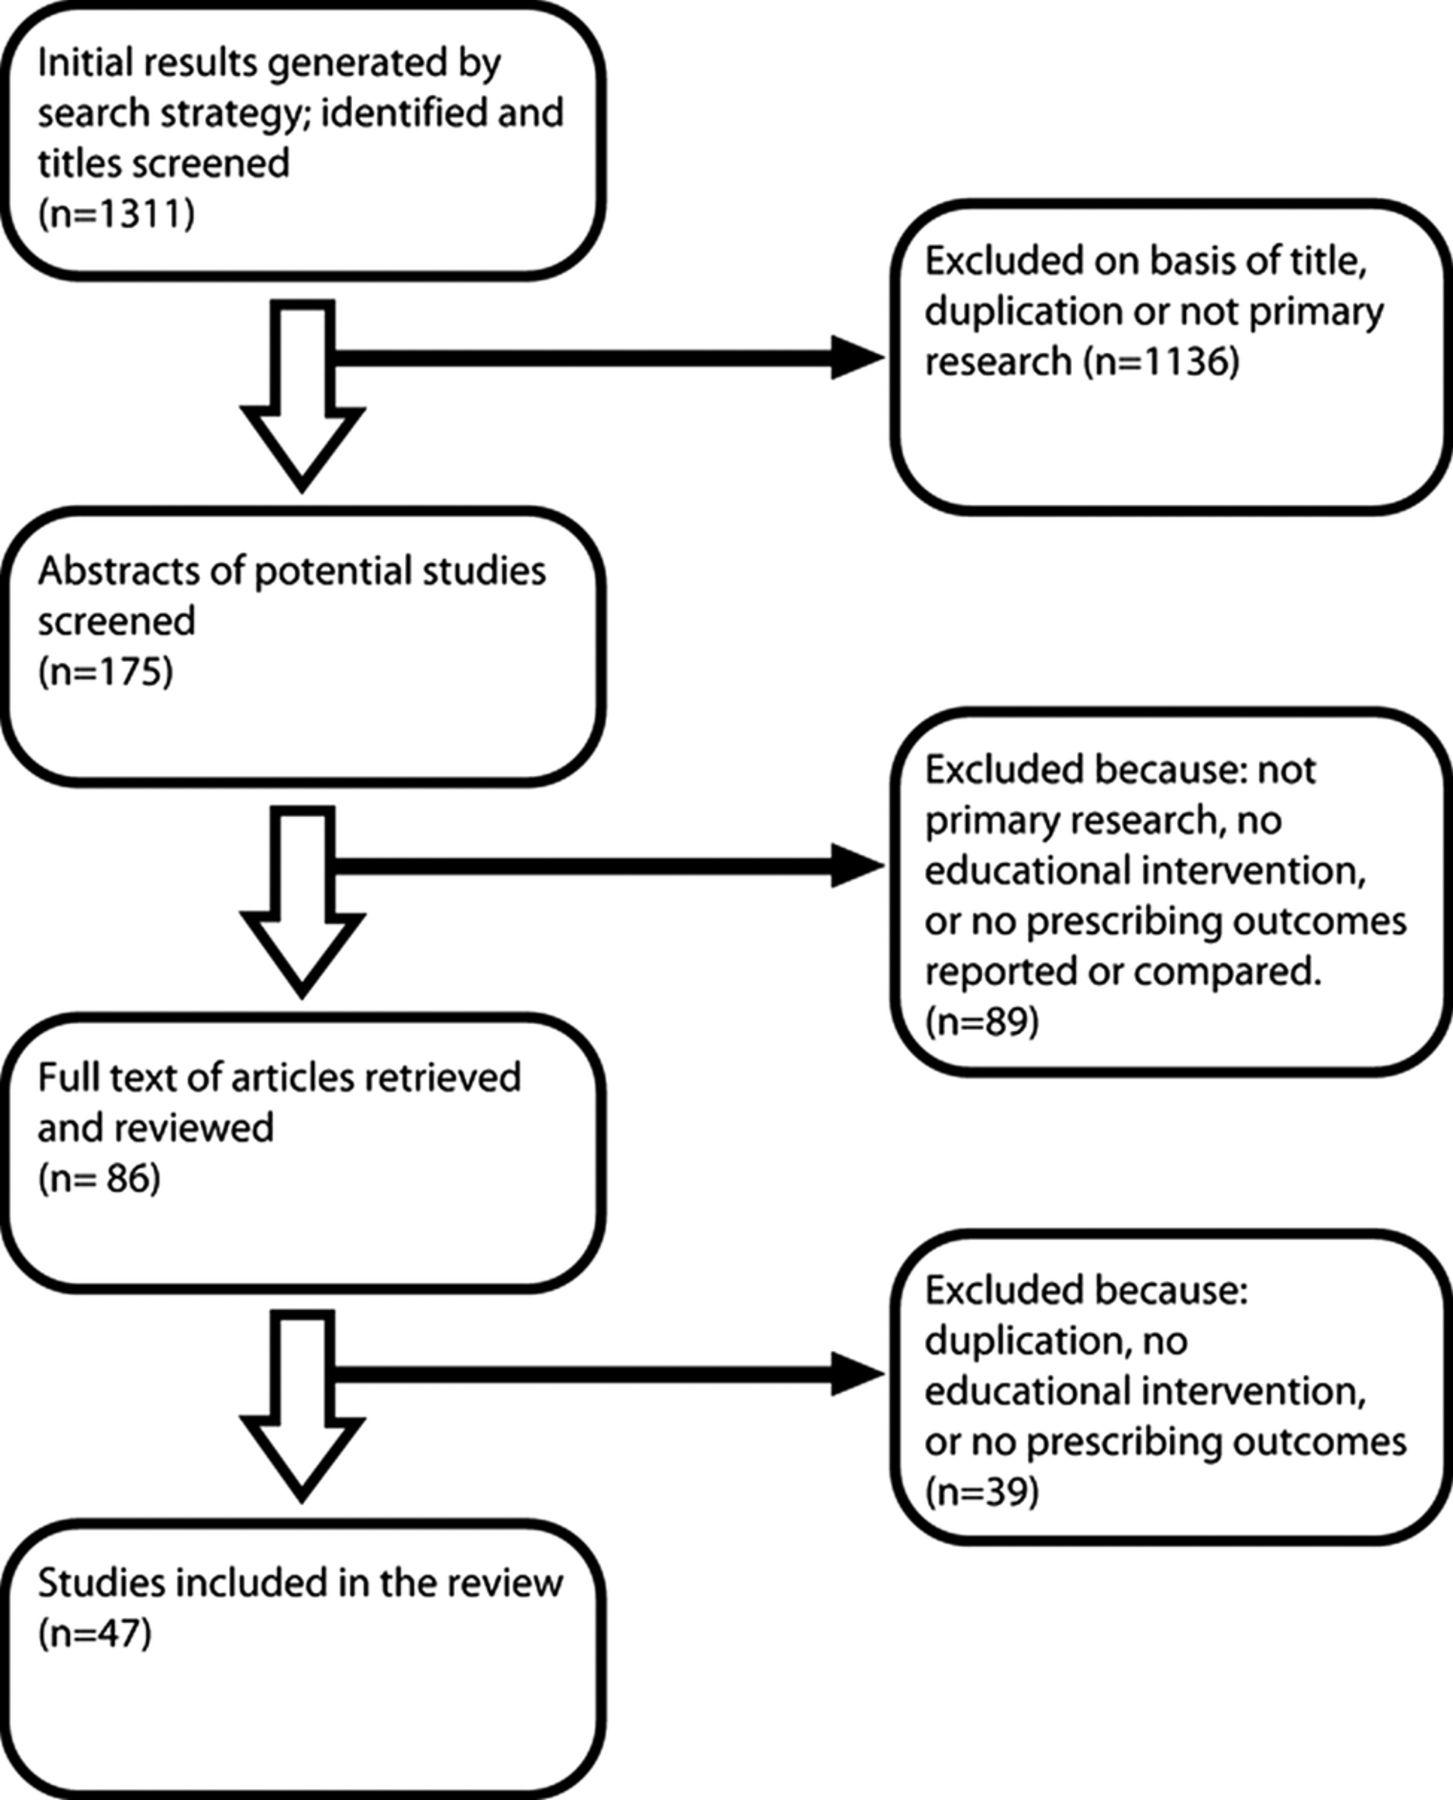 Educational interventions to improve prescribing